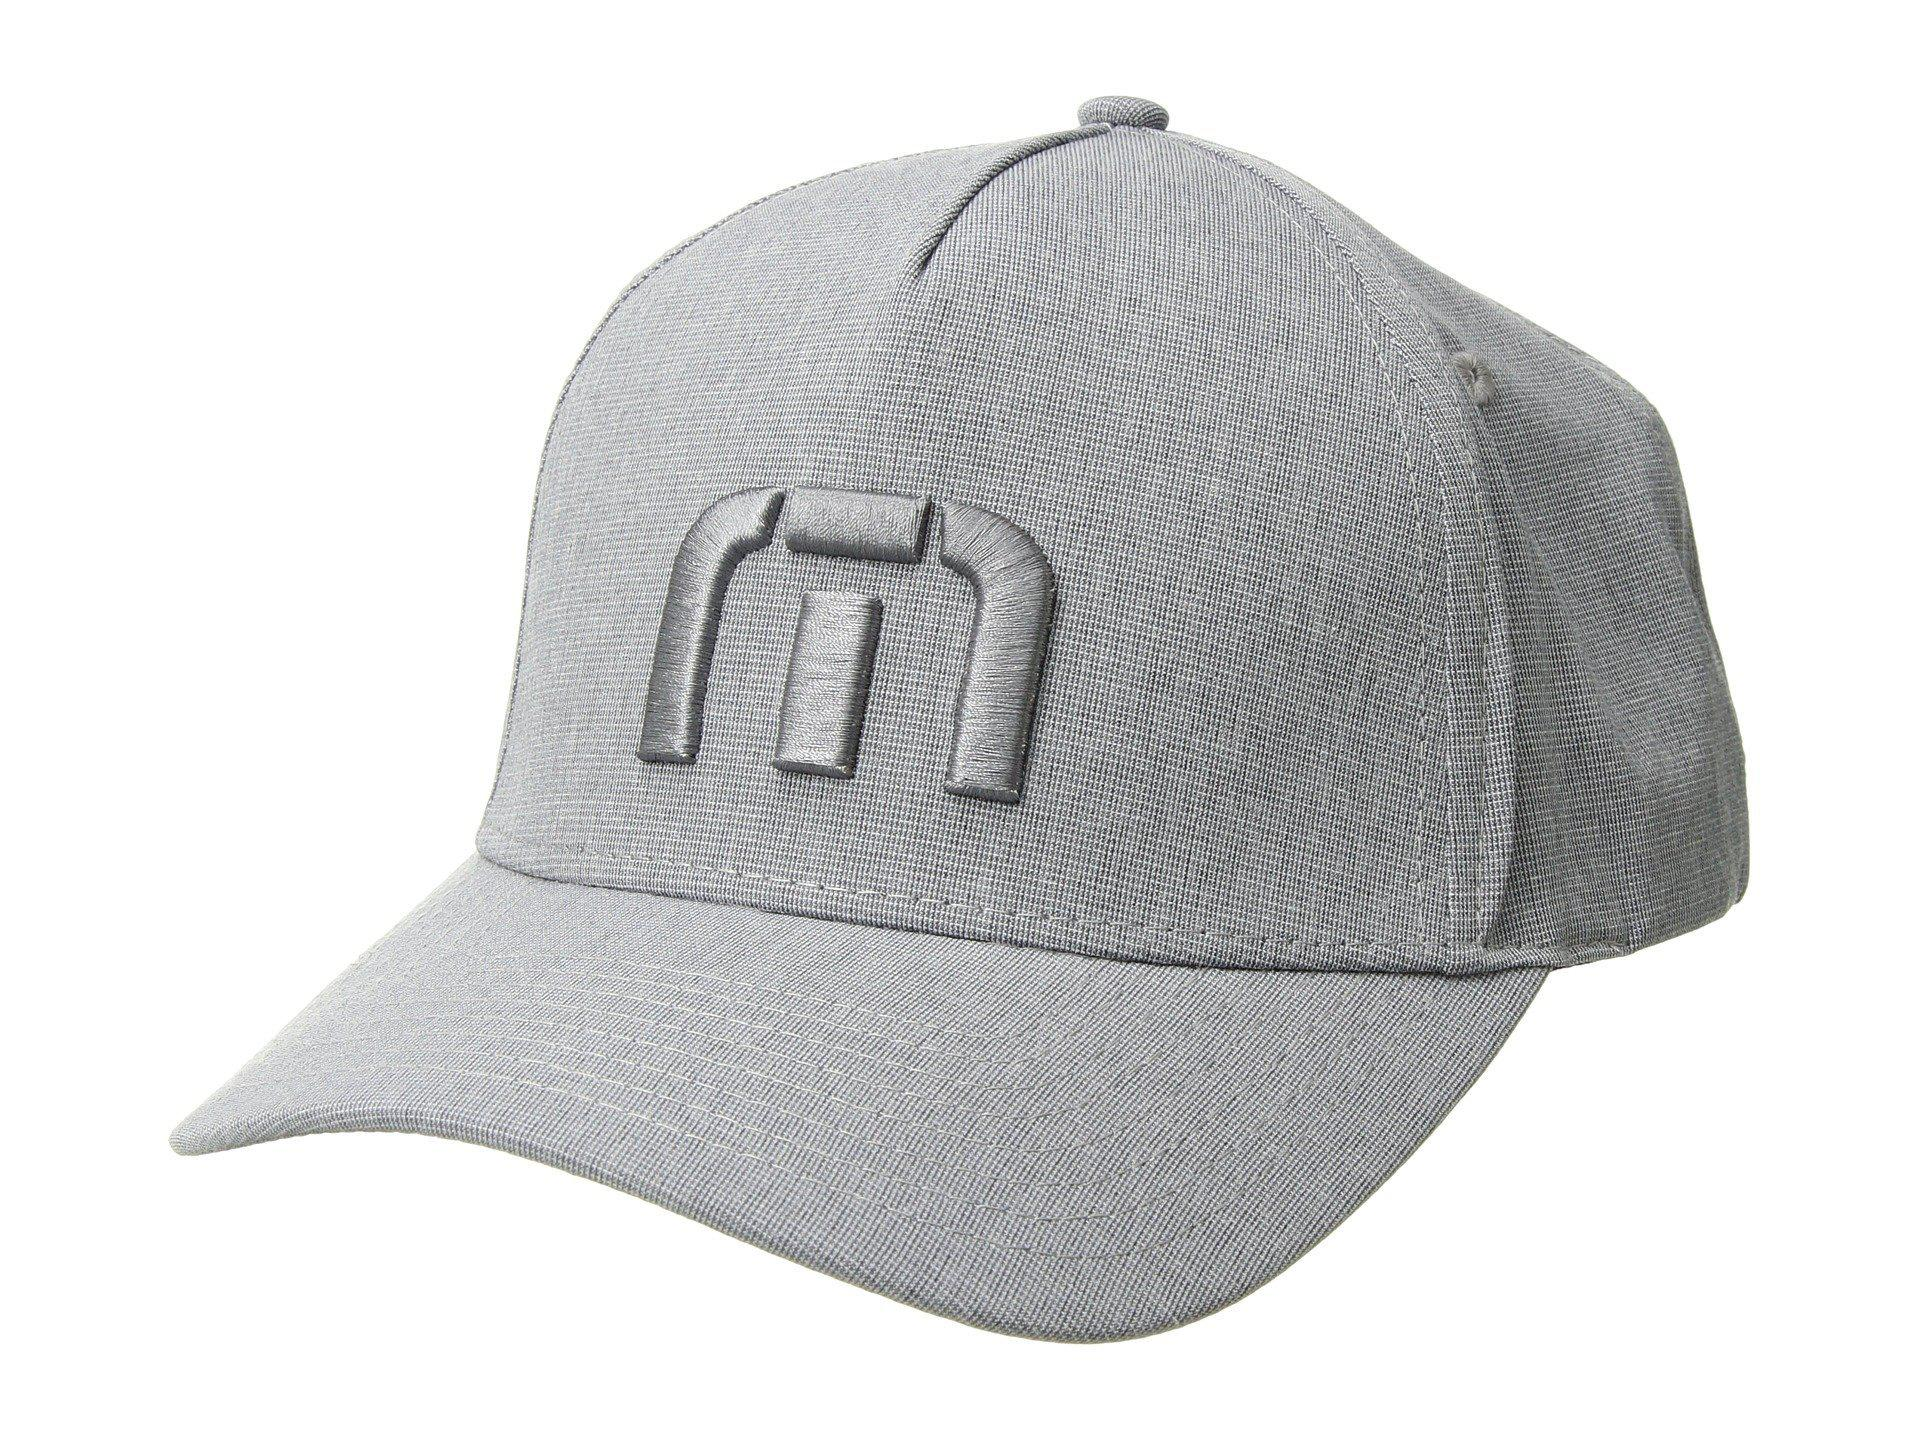 Lyst - Travis Mathew Top Shelf (light Grey) Baseball Caps in Gray ... e7d55be146b8